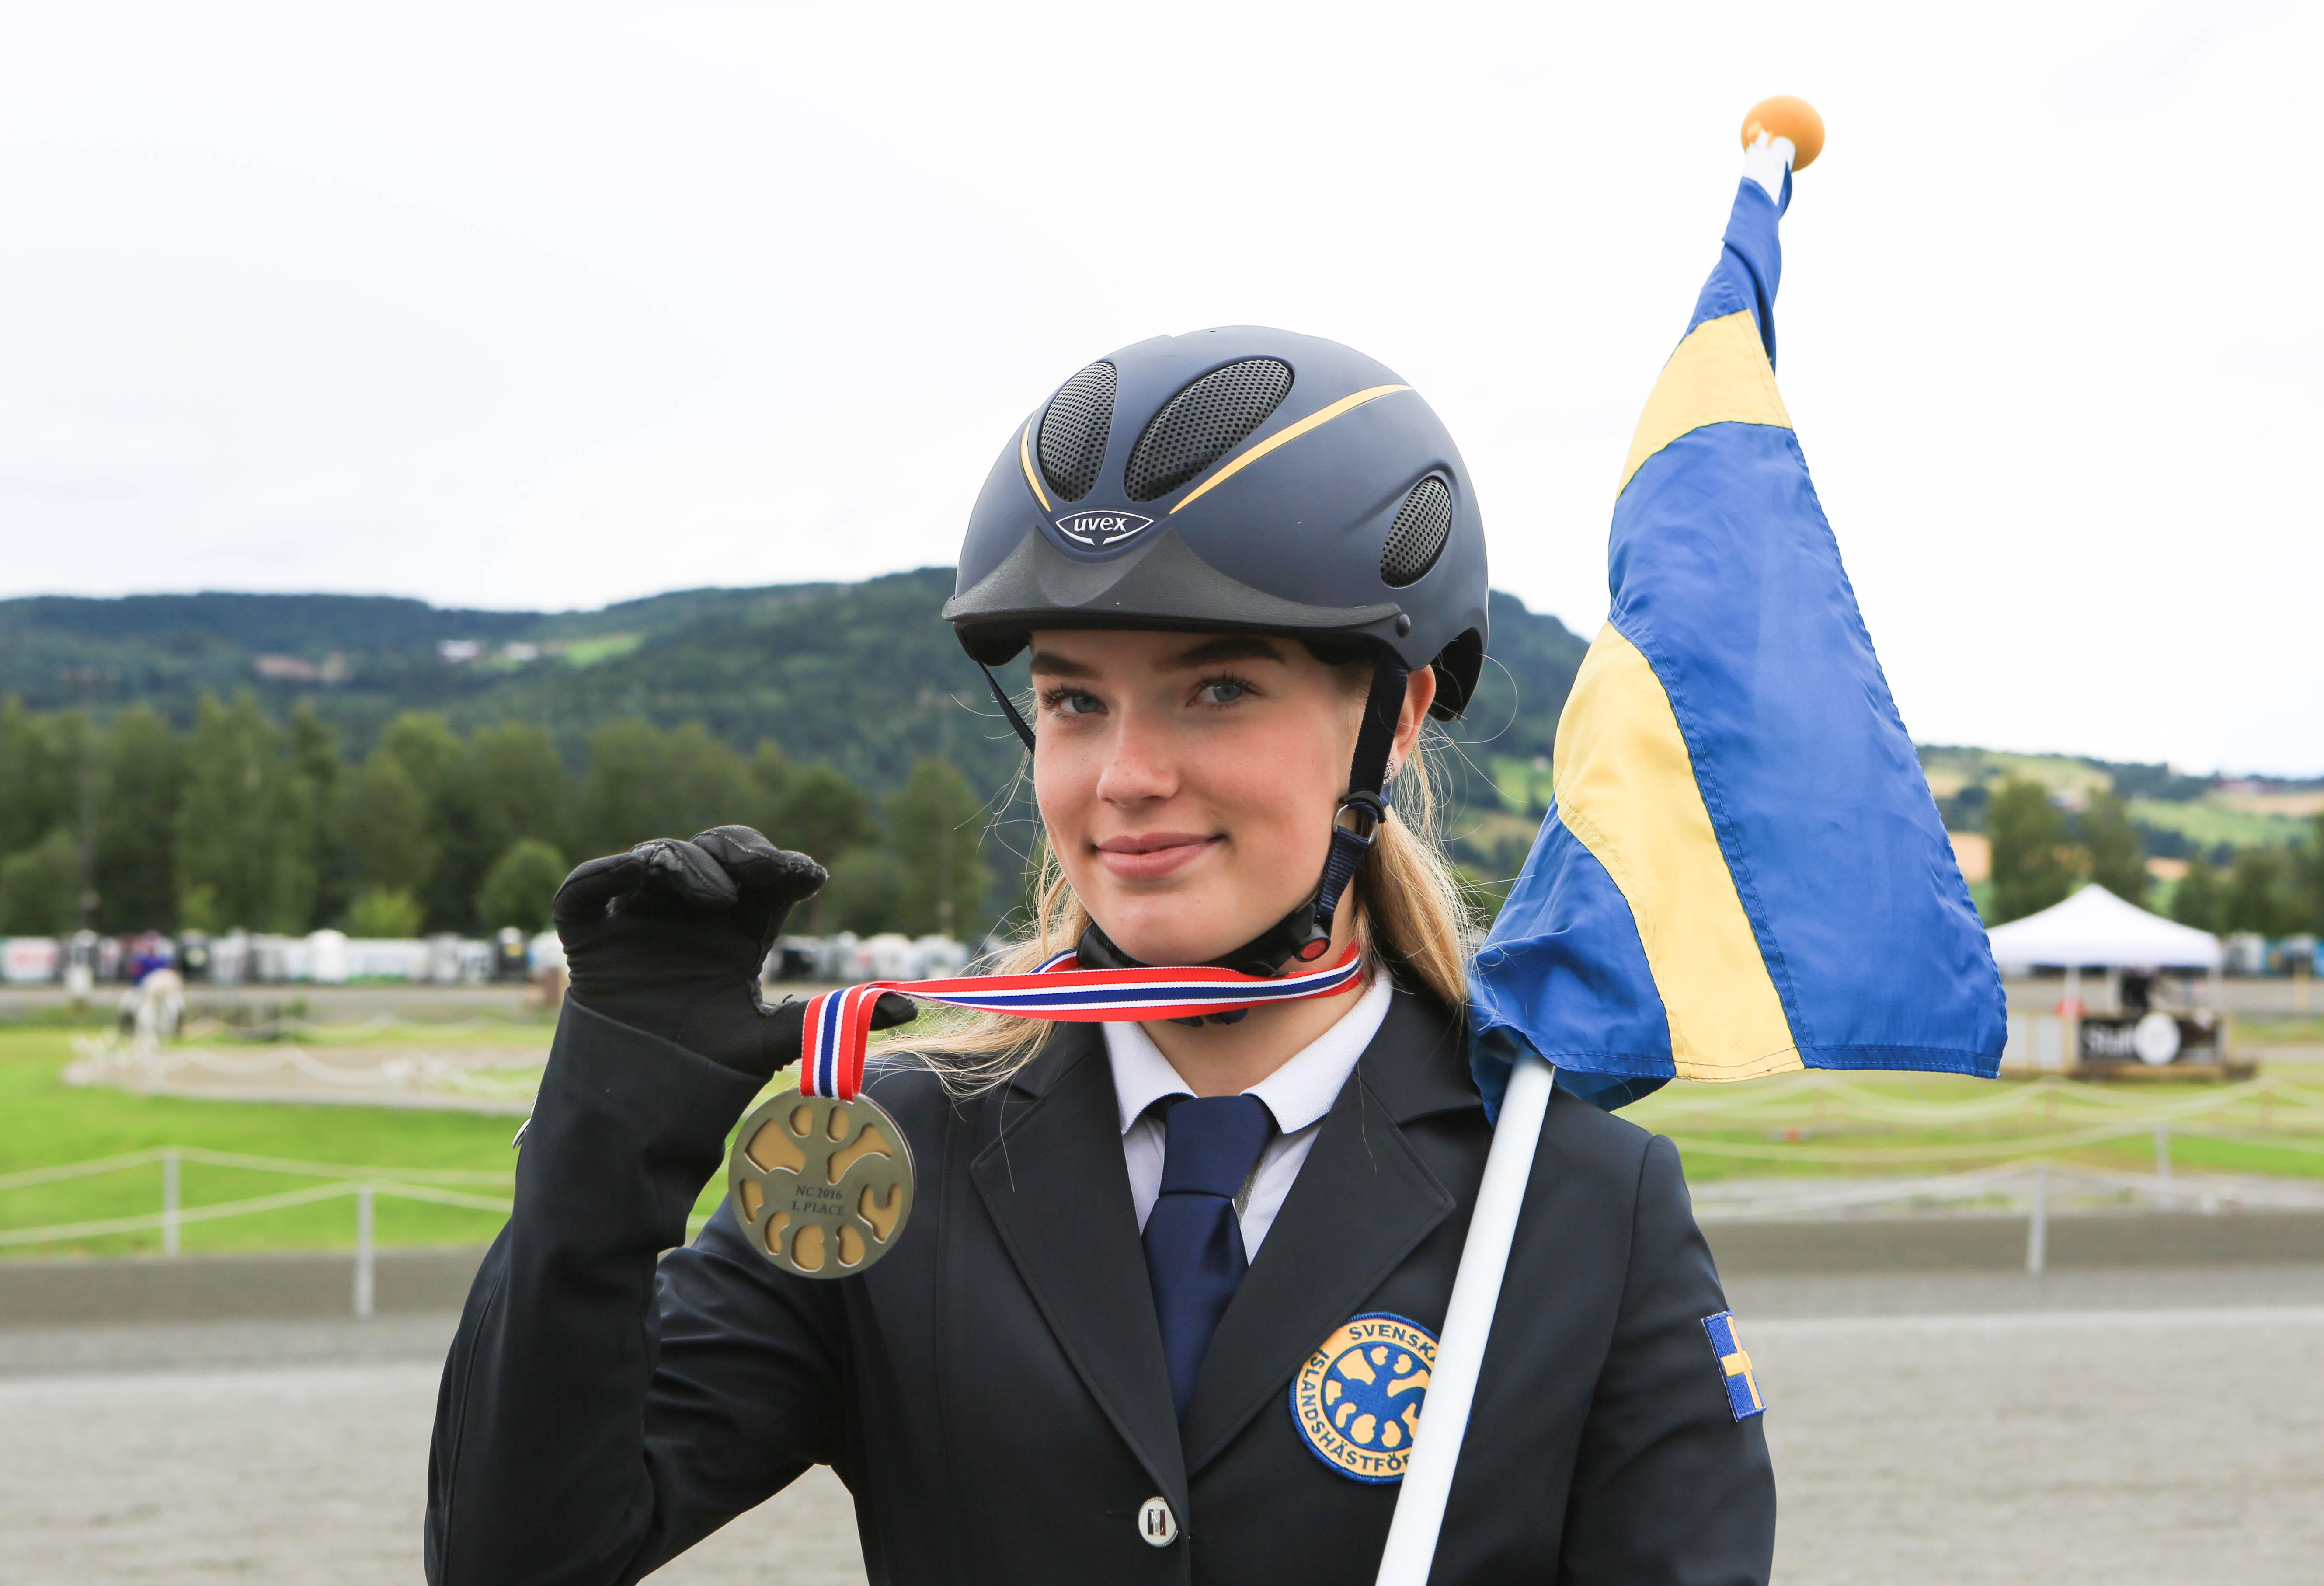 Guldmedaljen!